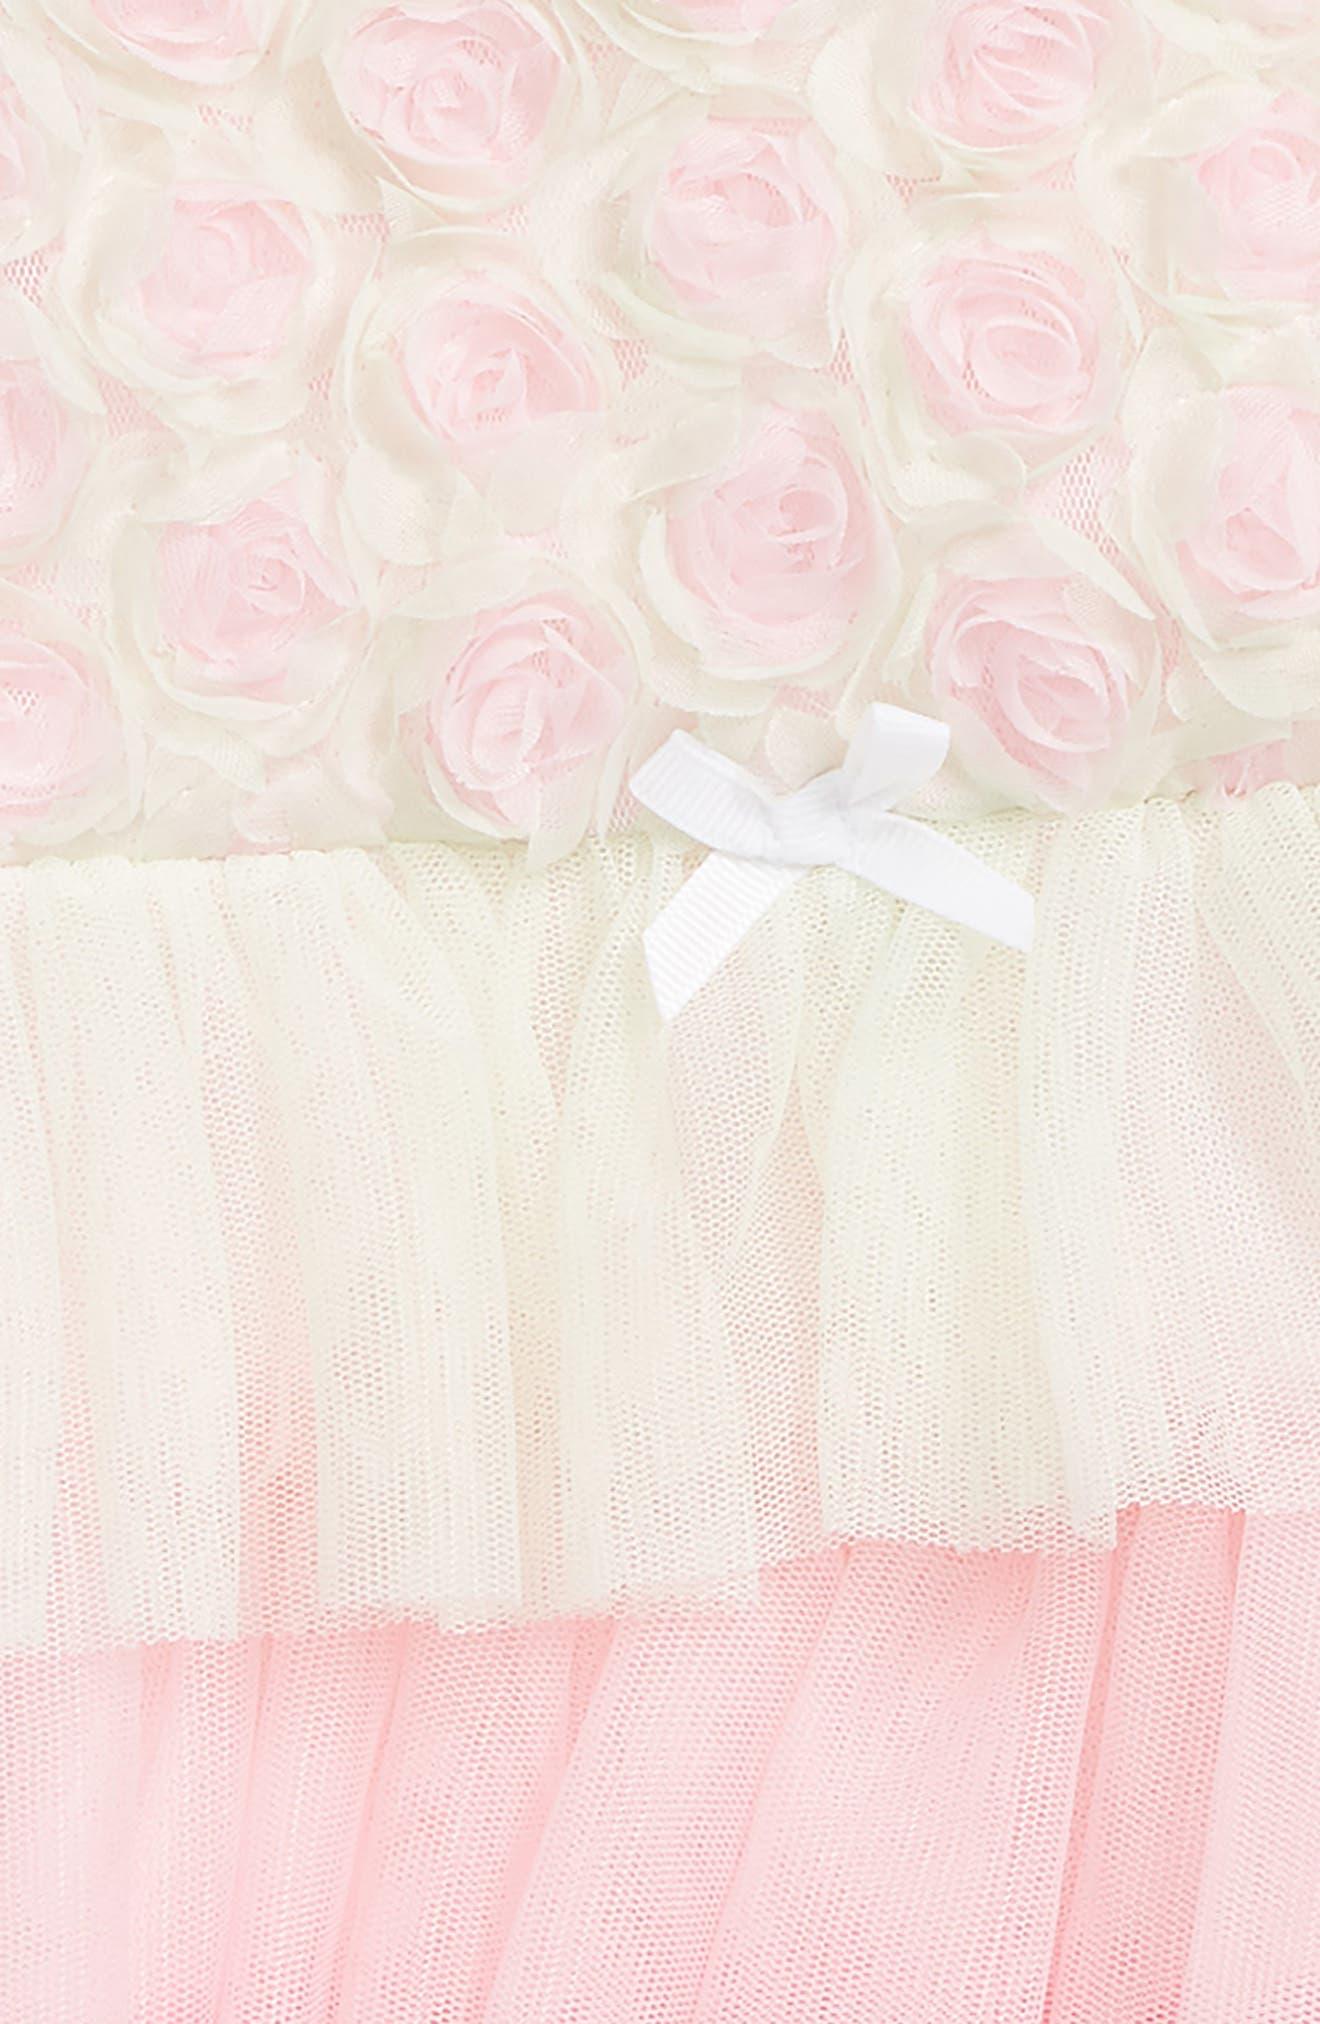 Rosette Popover Bodysuit & Head Wrap Set,                             Alternate thumbnail 2, color,